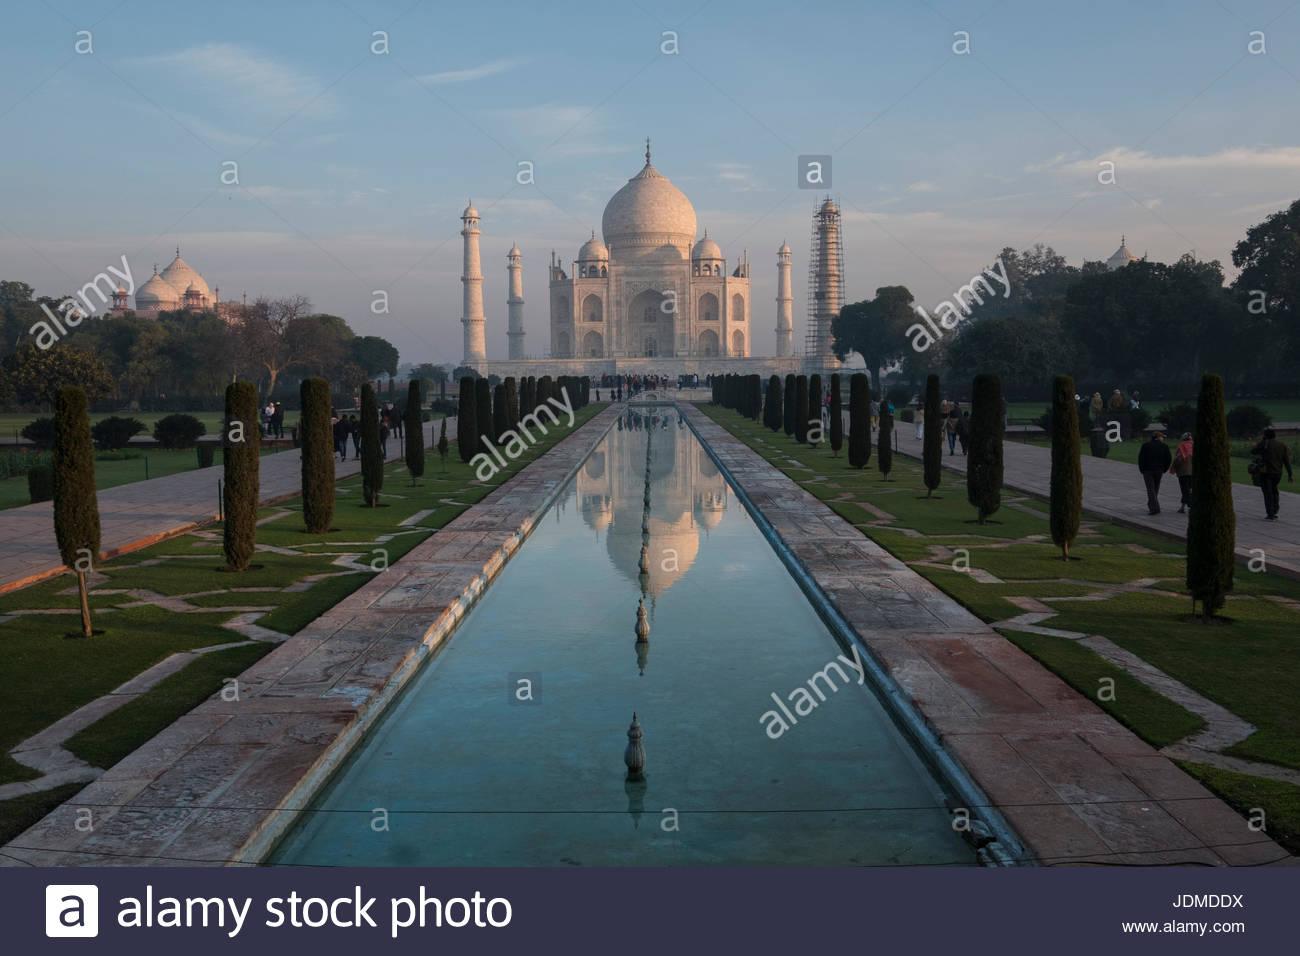 The Taj Mahal in Agra. Stock Photo